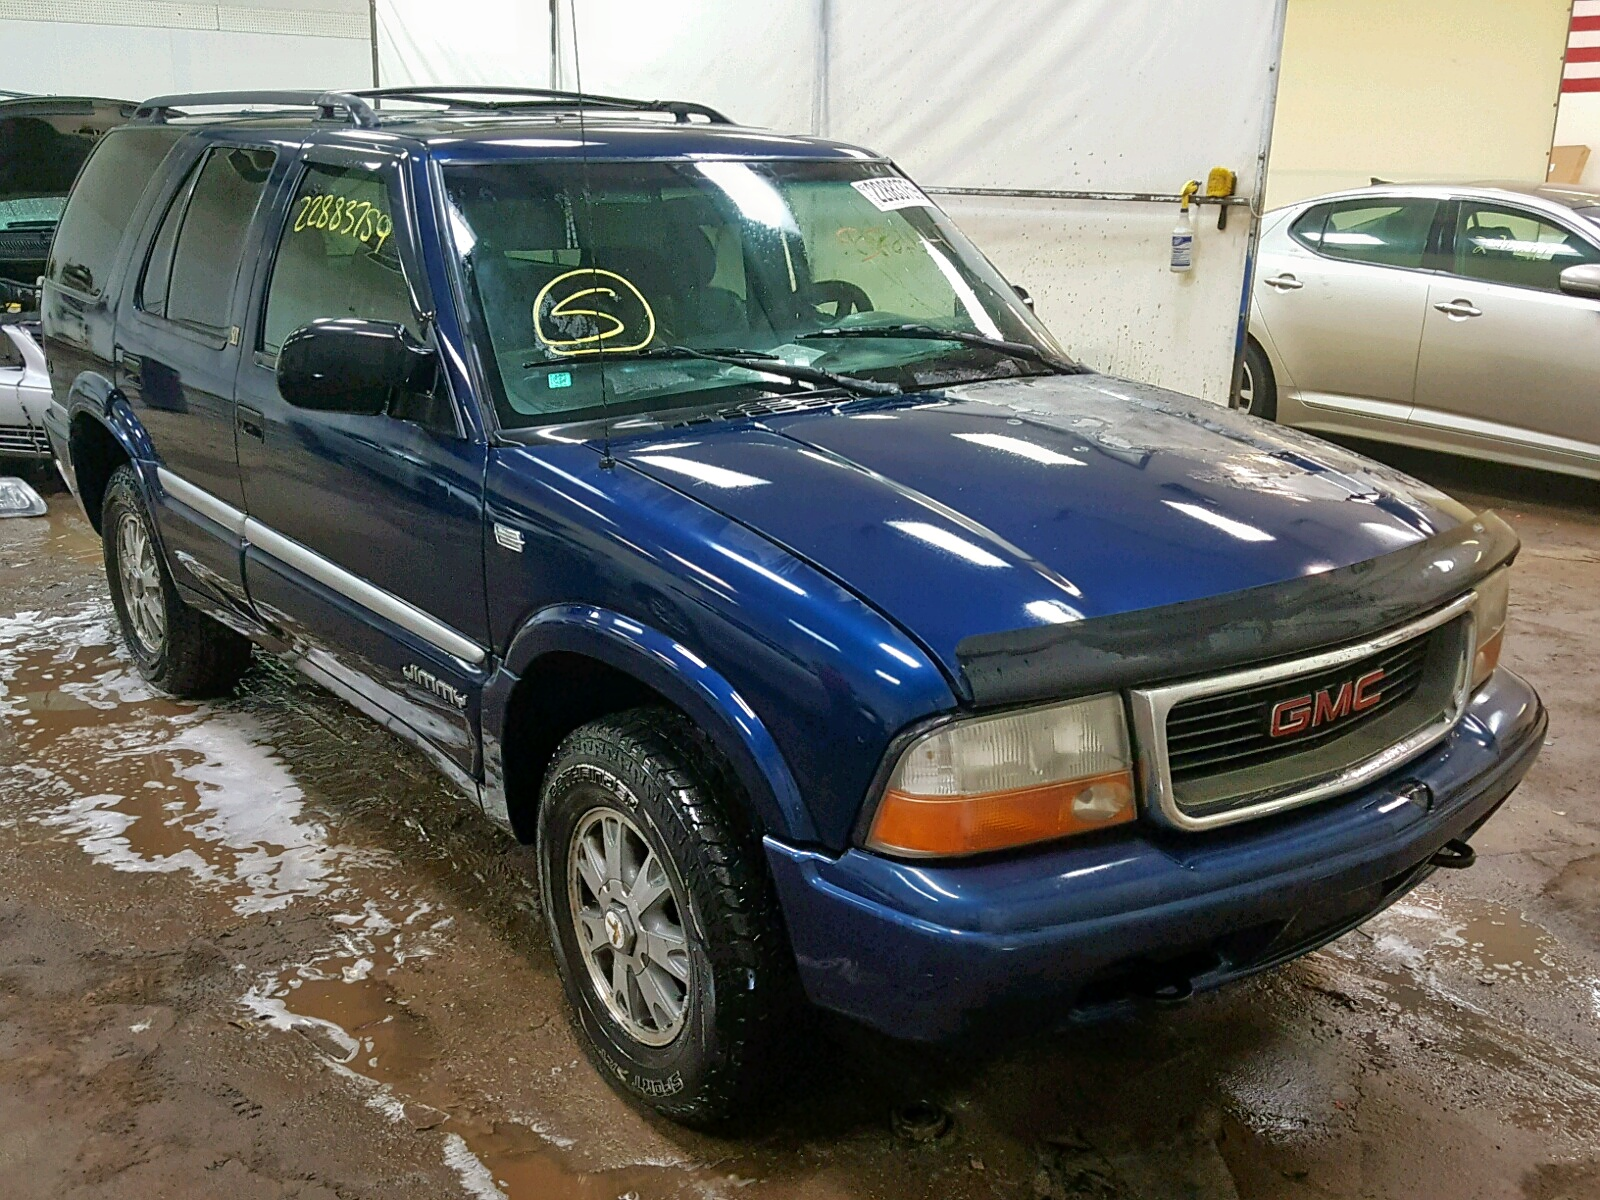 Salvage 2000 GMC JIMMY / EN for sale